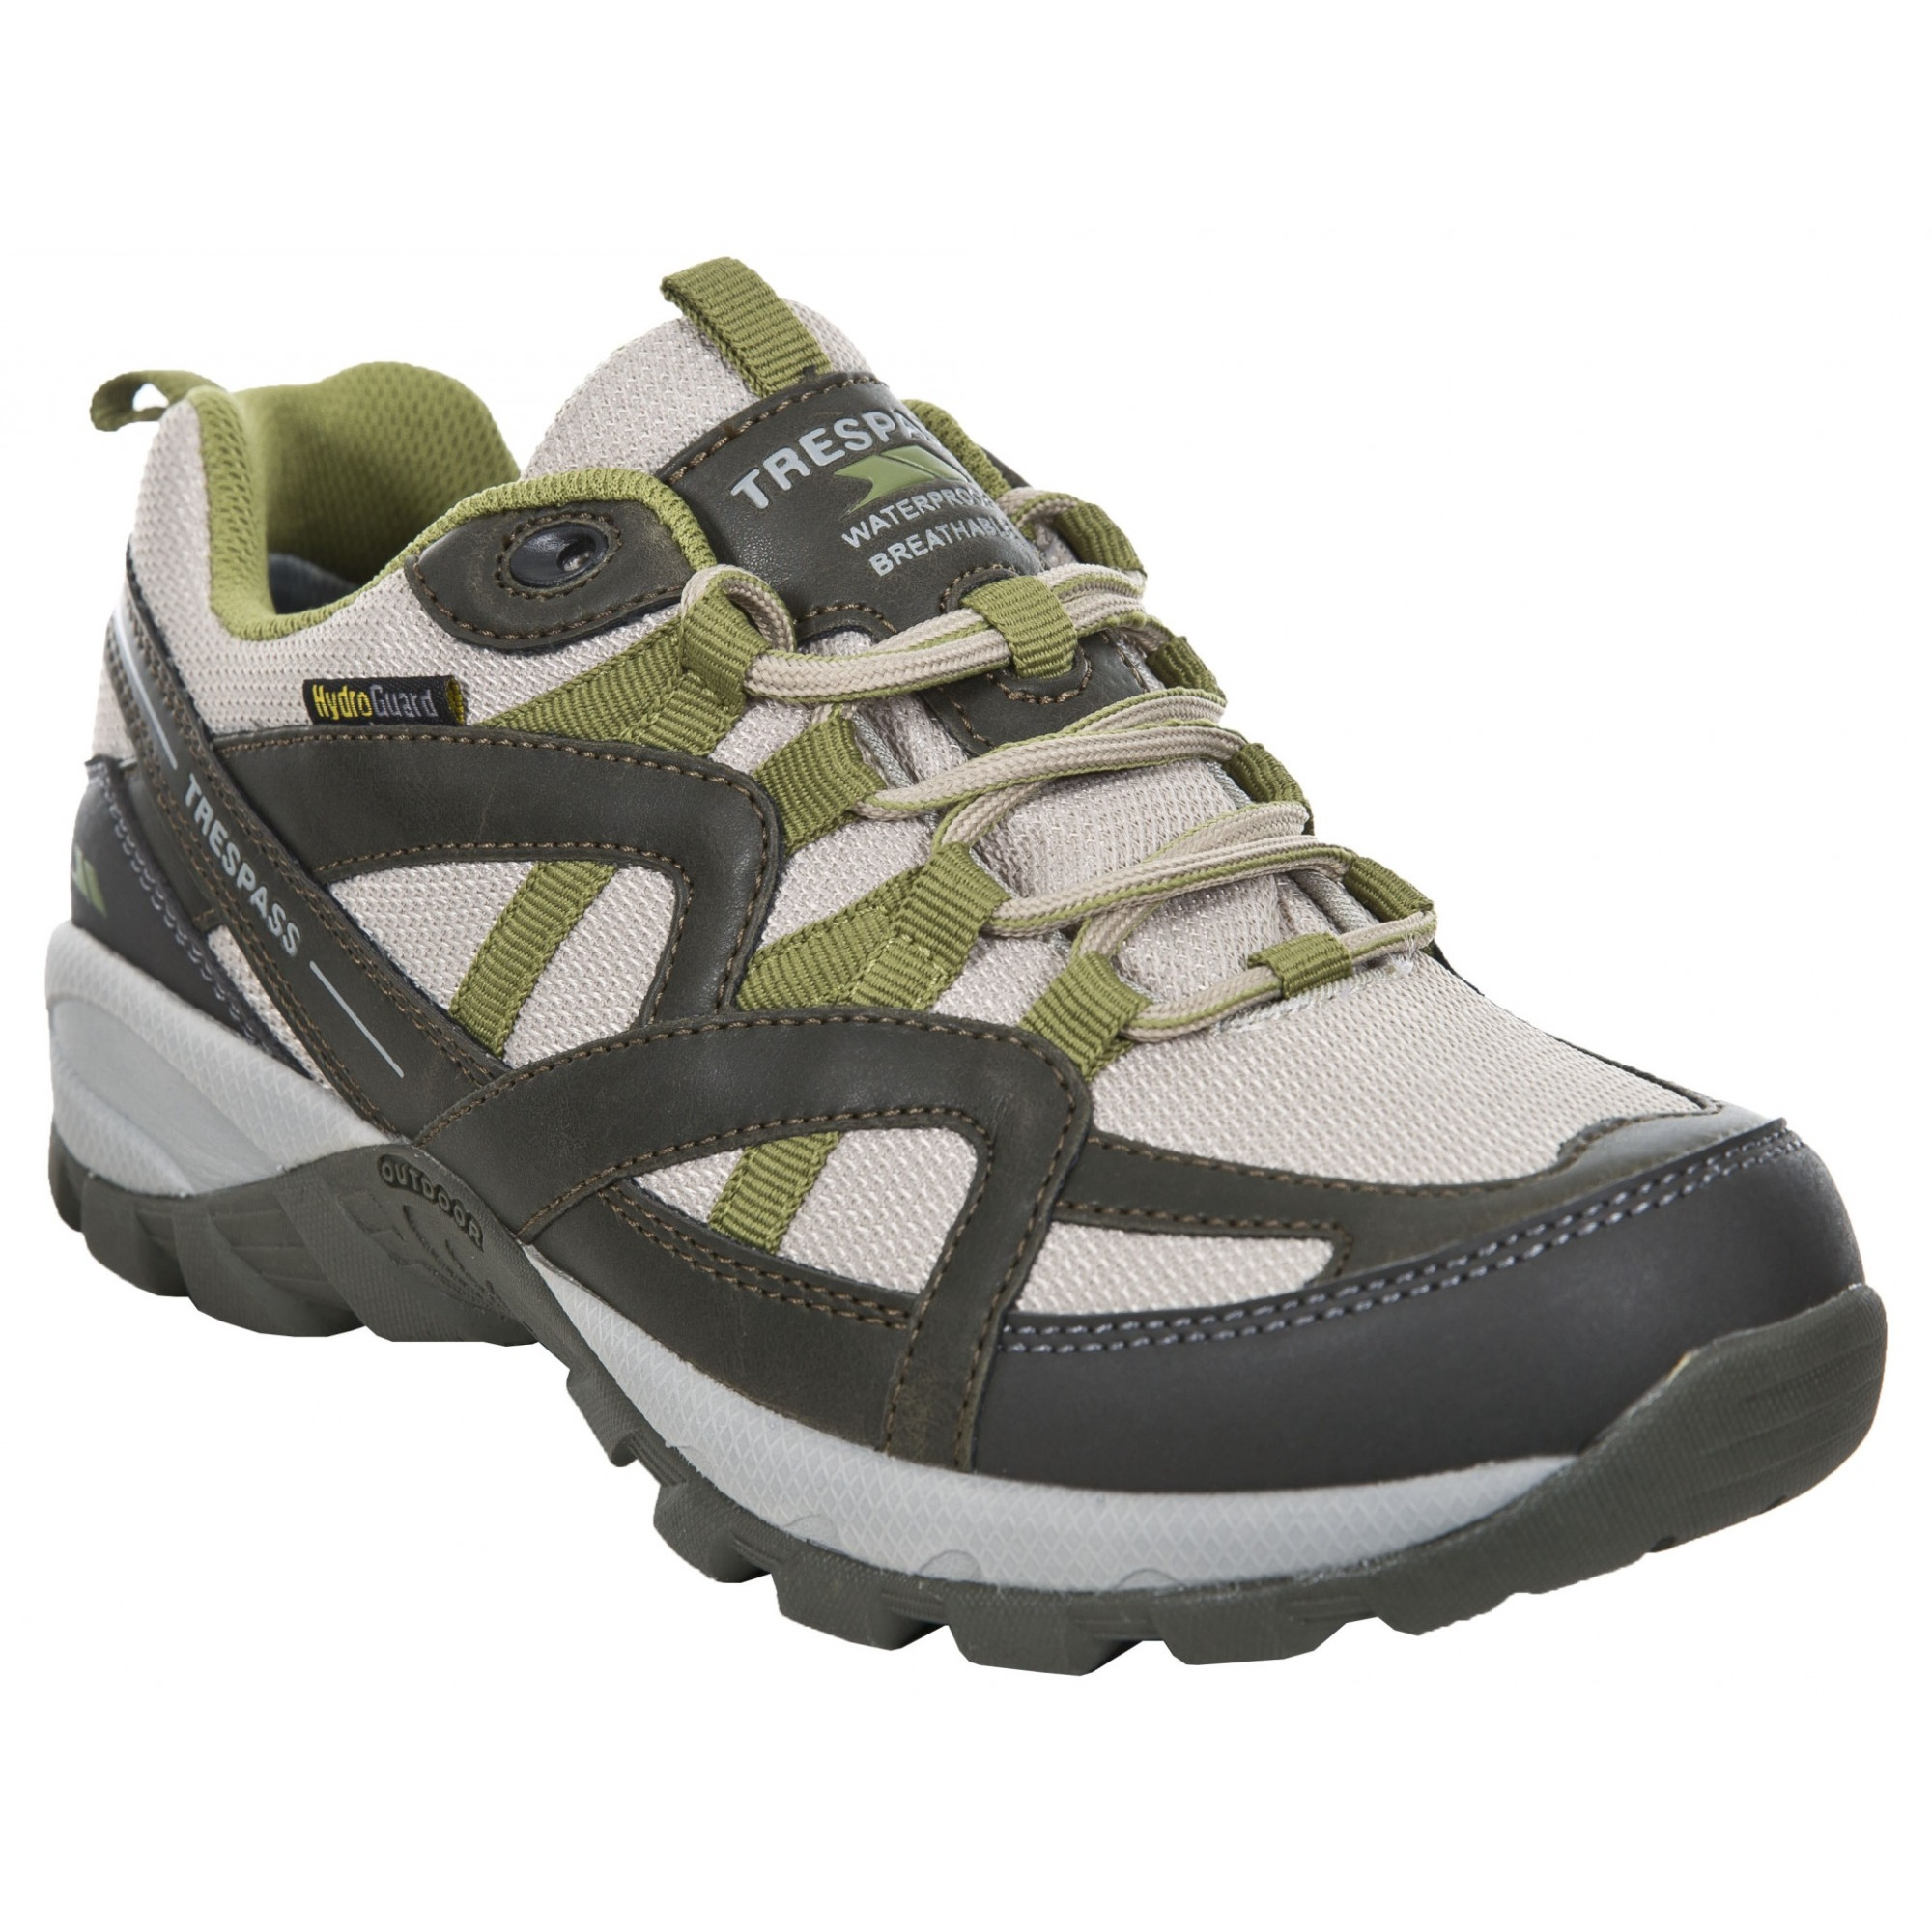 Trespass - Zapatillas deportivas de senderismo modelo Talus para mujer (TP2966)